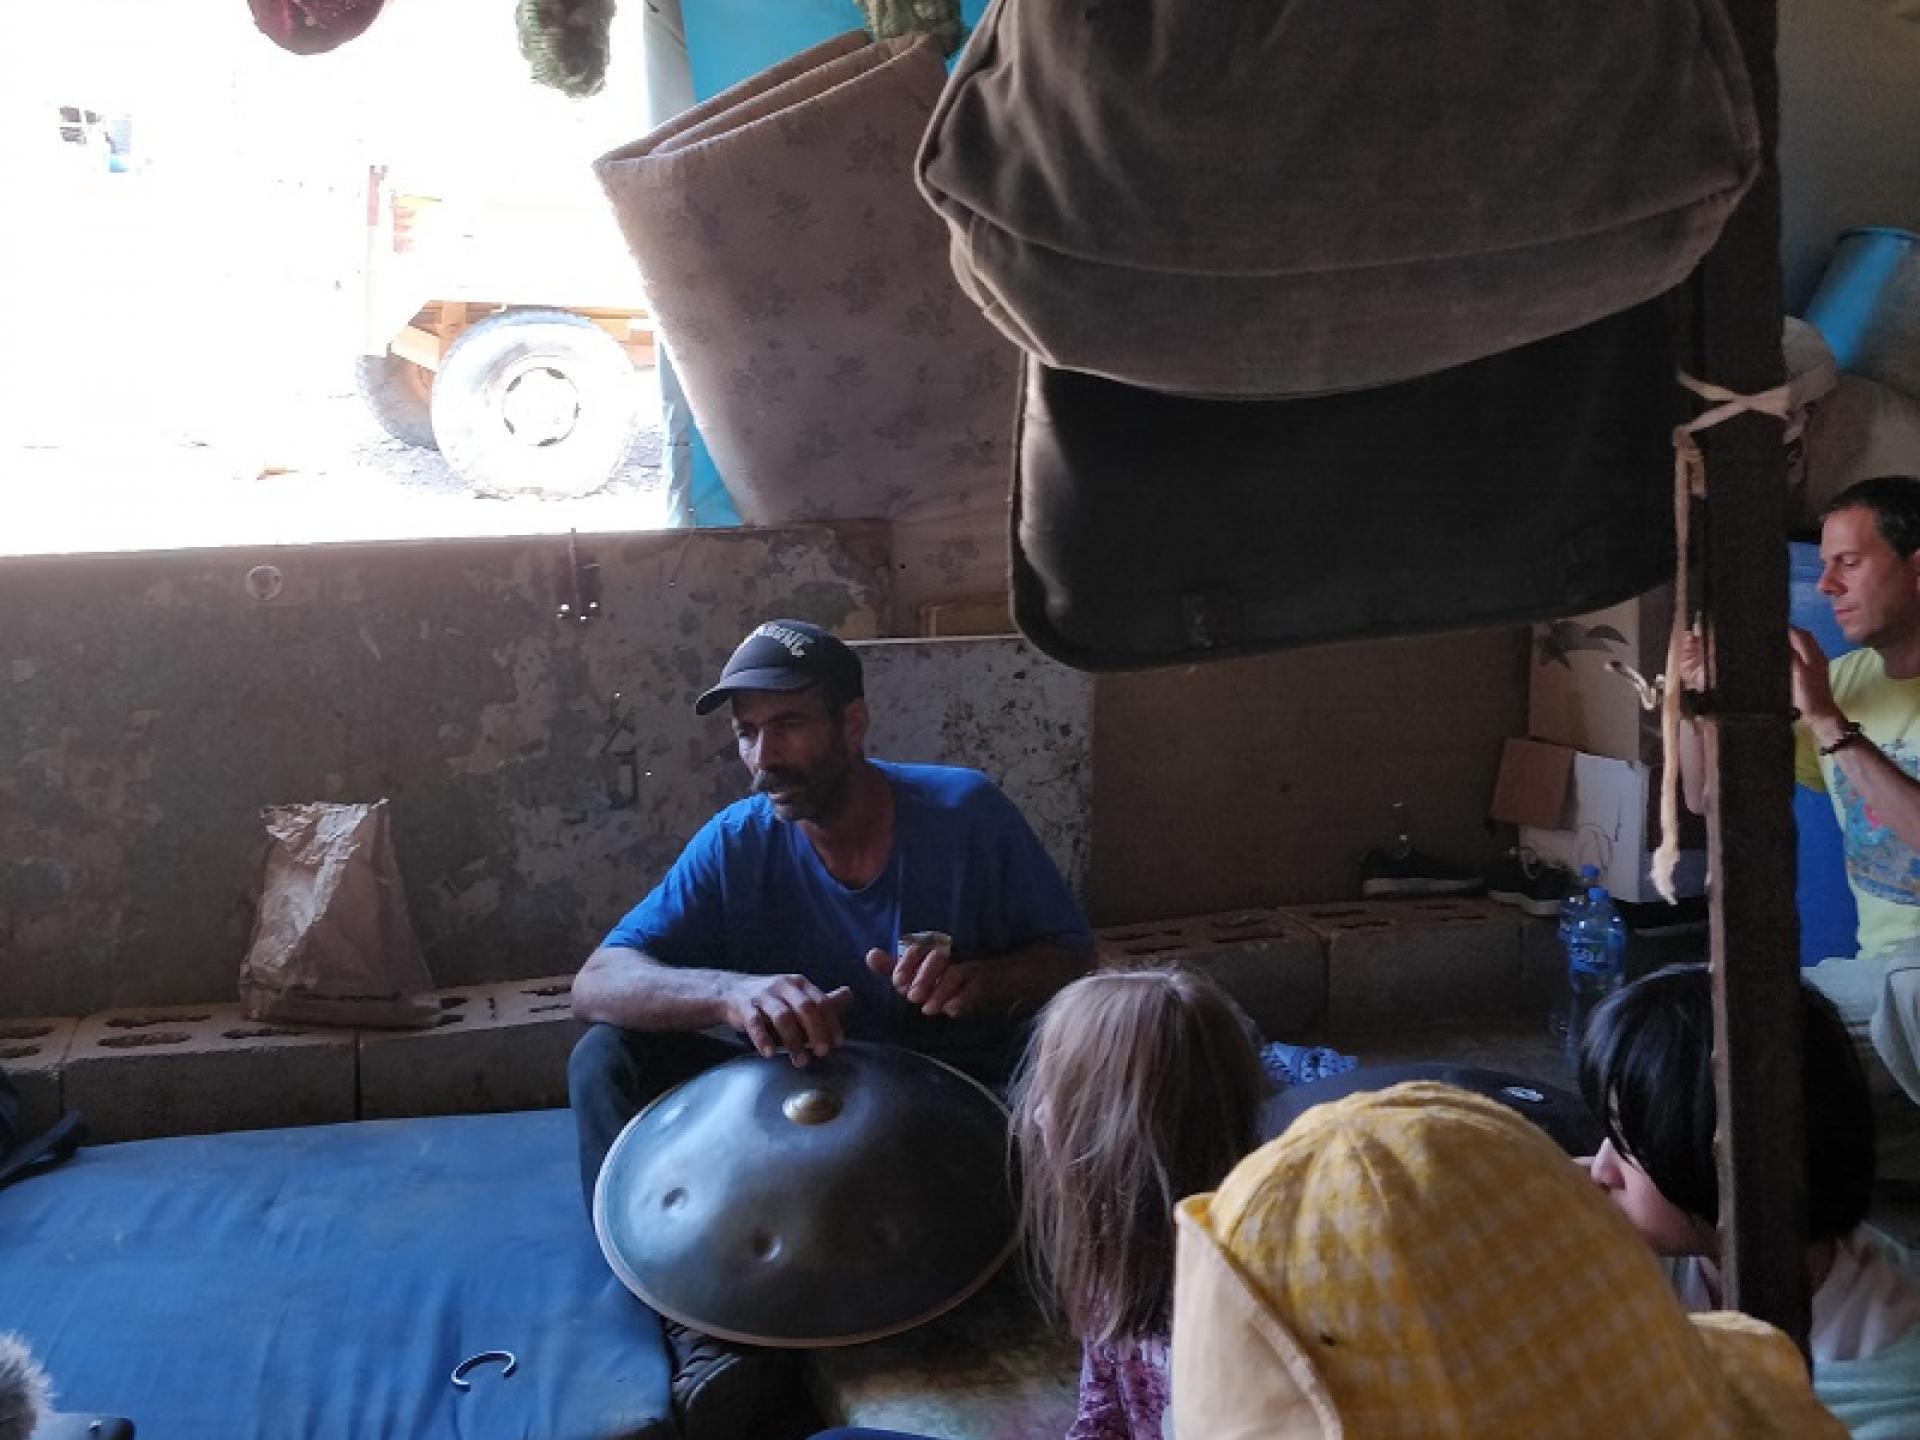 The Palestinian Jordan Valley: Bourhan drumming the Tam Tam